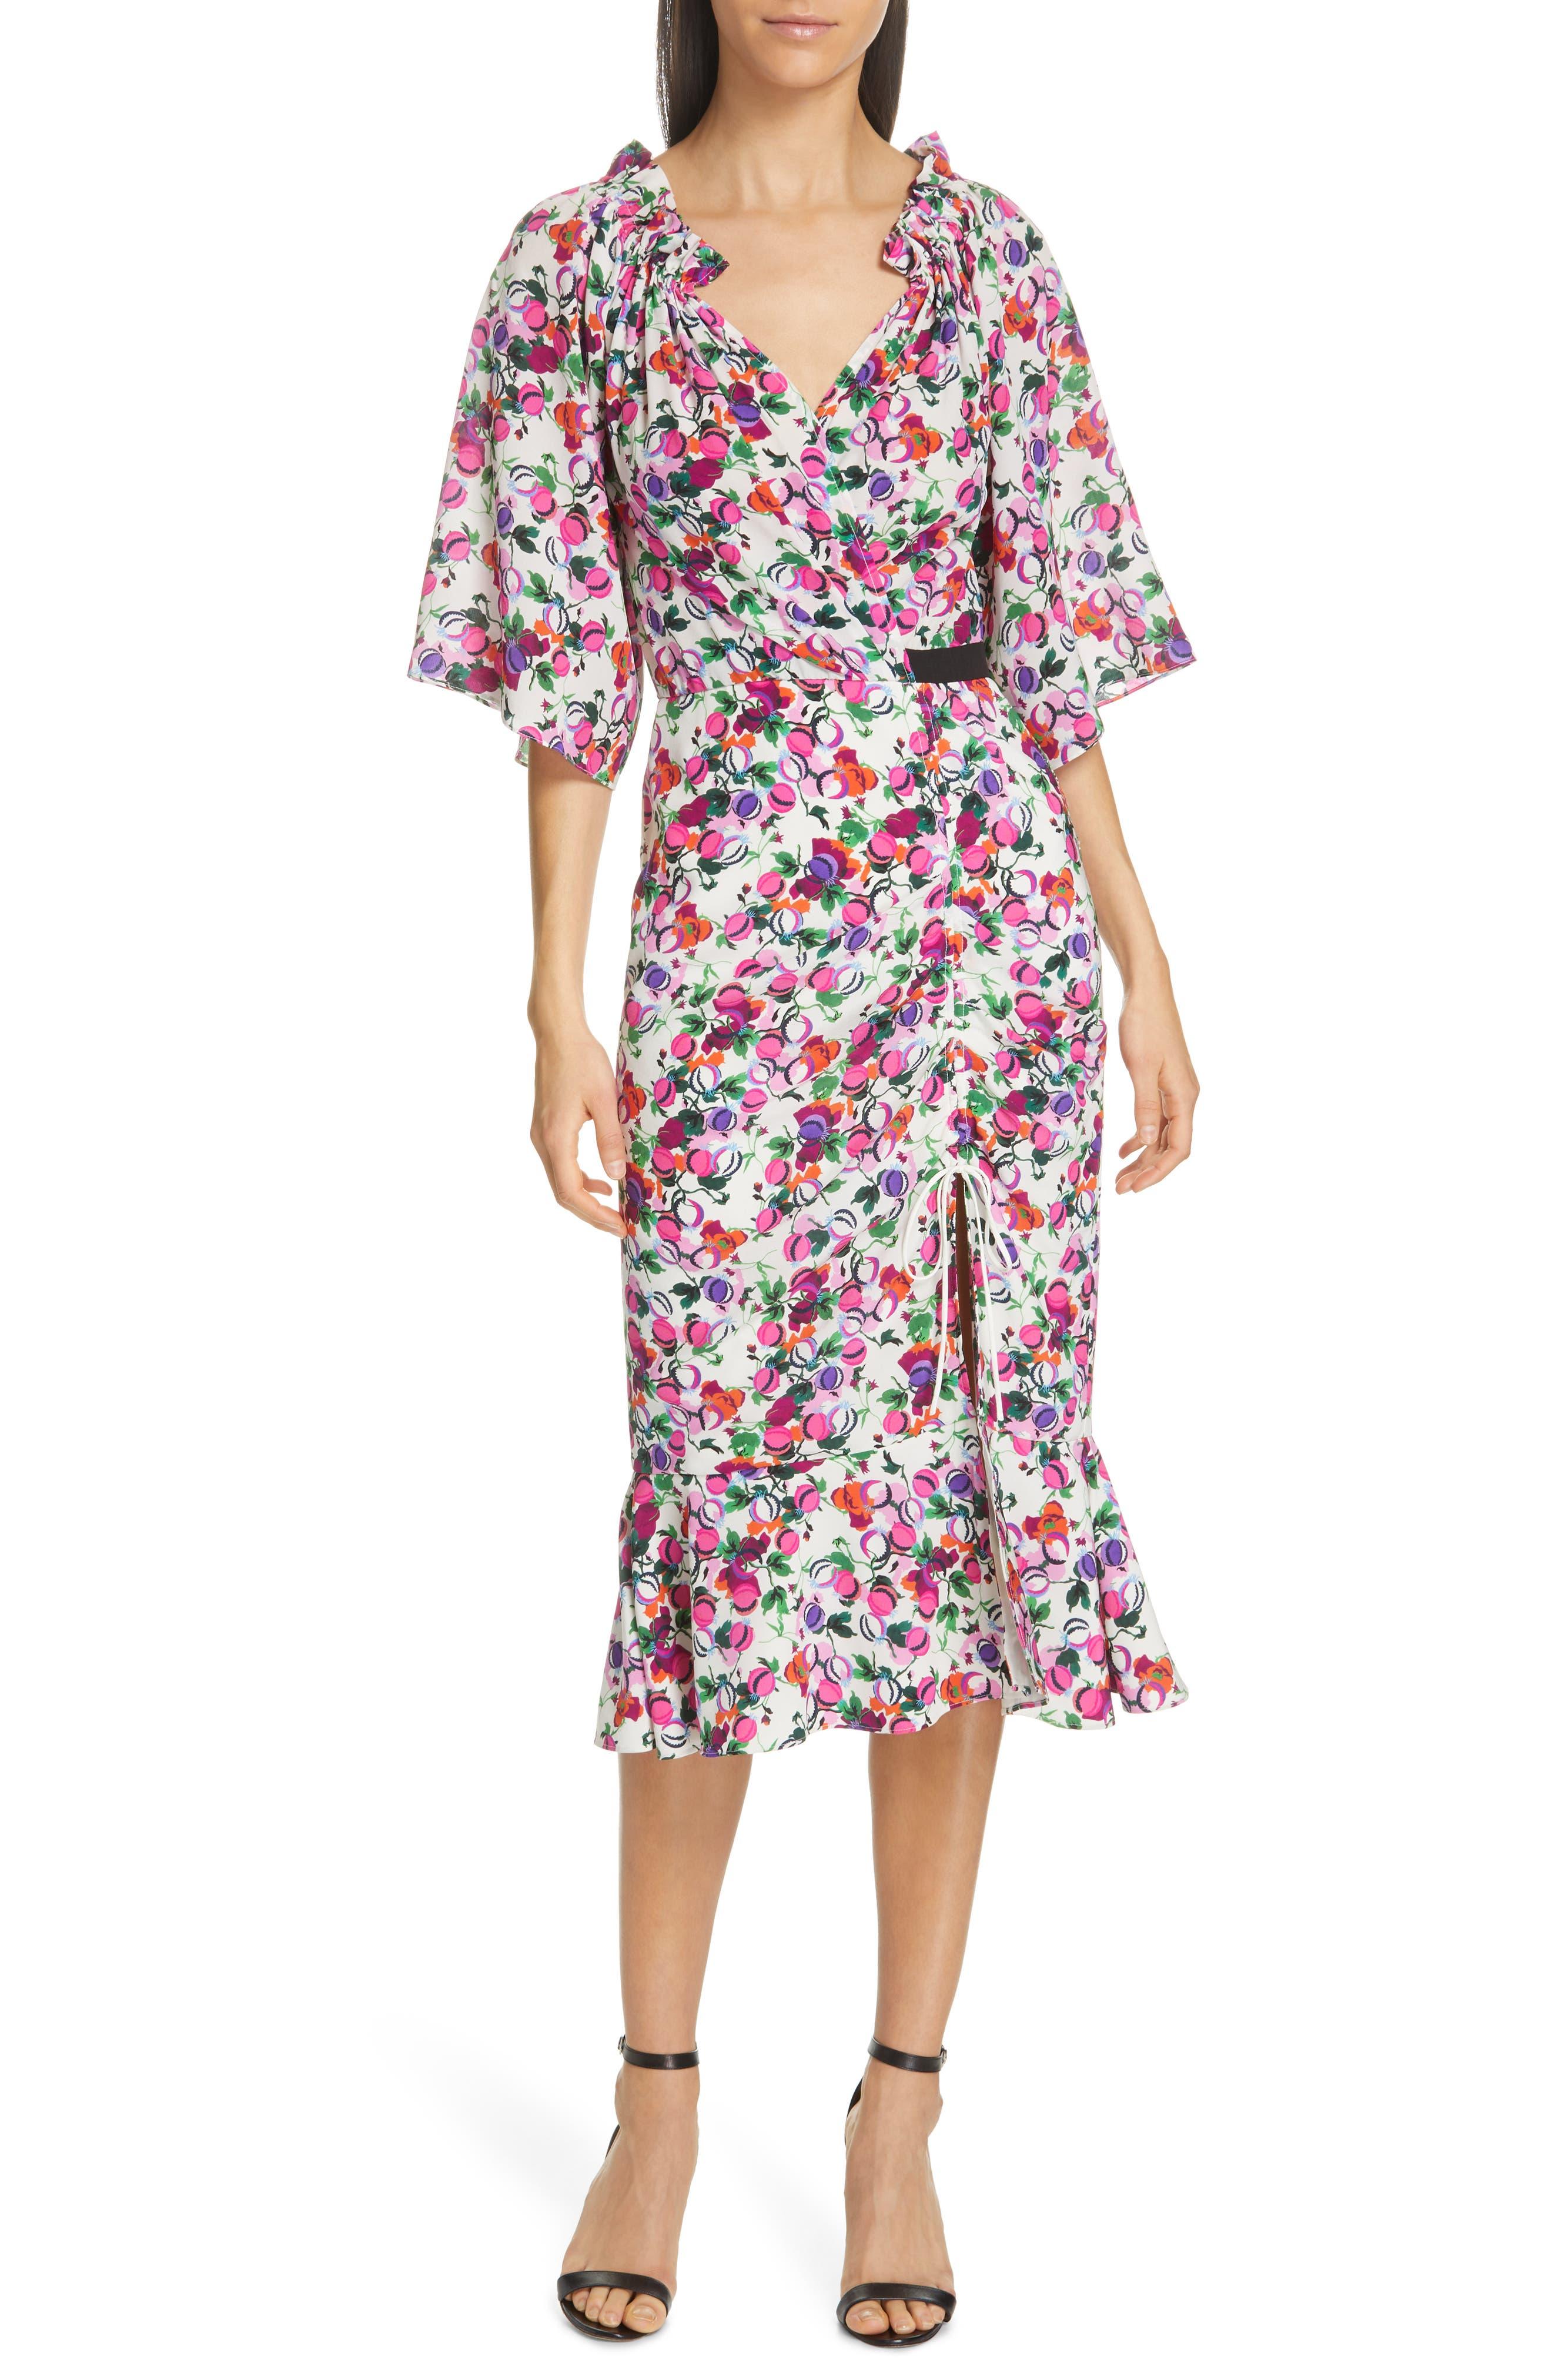 Saloni Olivia Floral Print Off The Shoulder Midi Dress, White